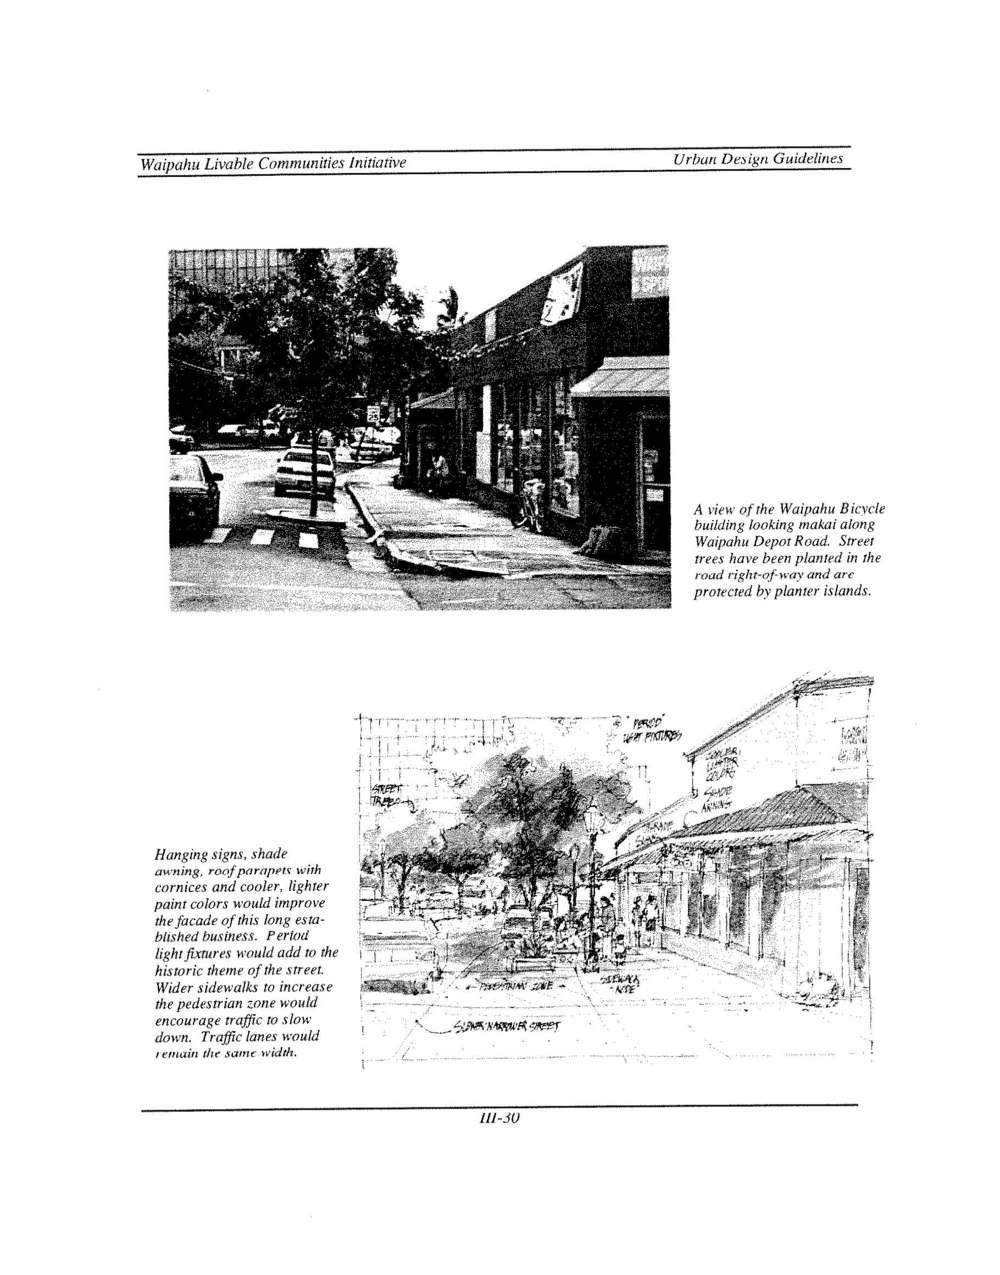 160531_WaipahuLivableCommunities(1998)_Page_120.jpg